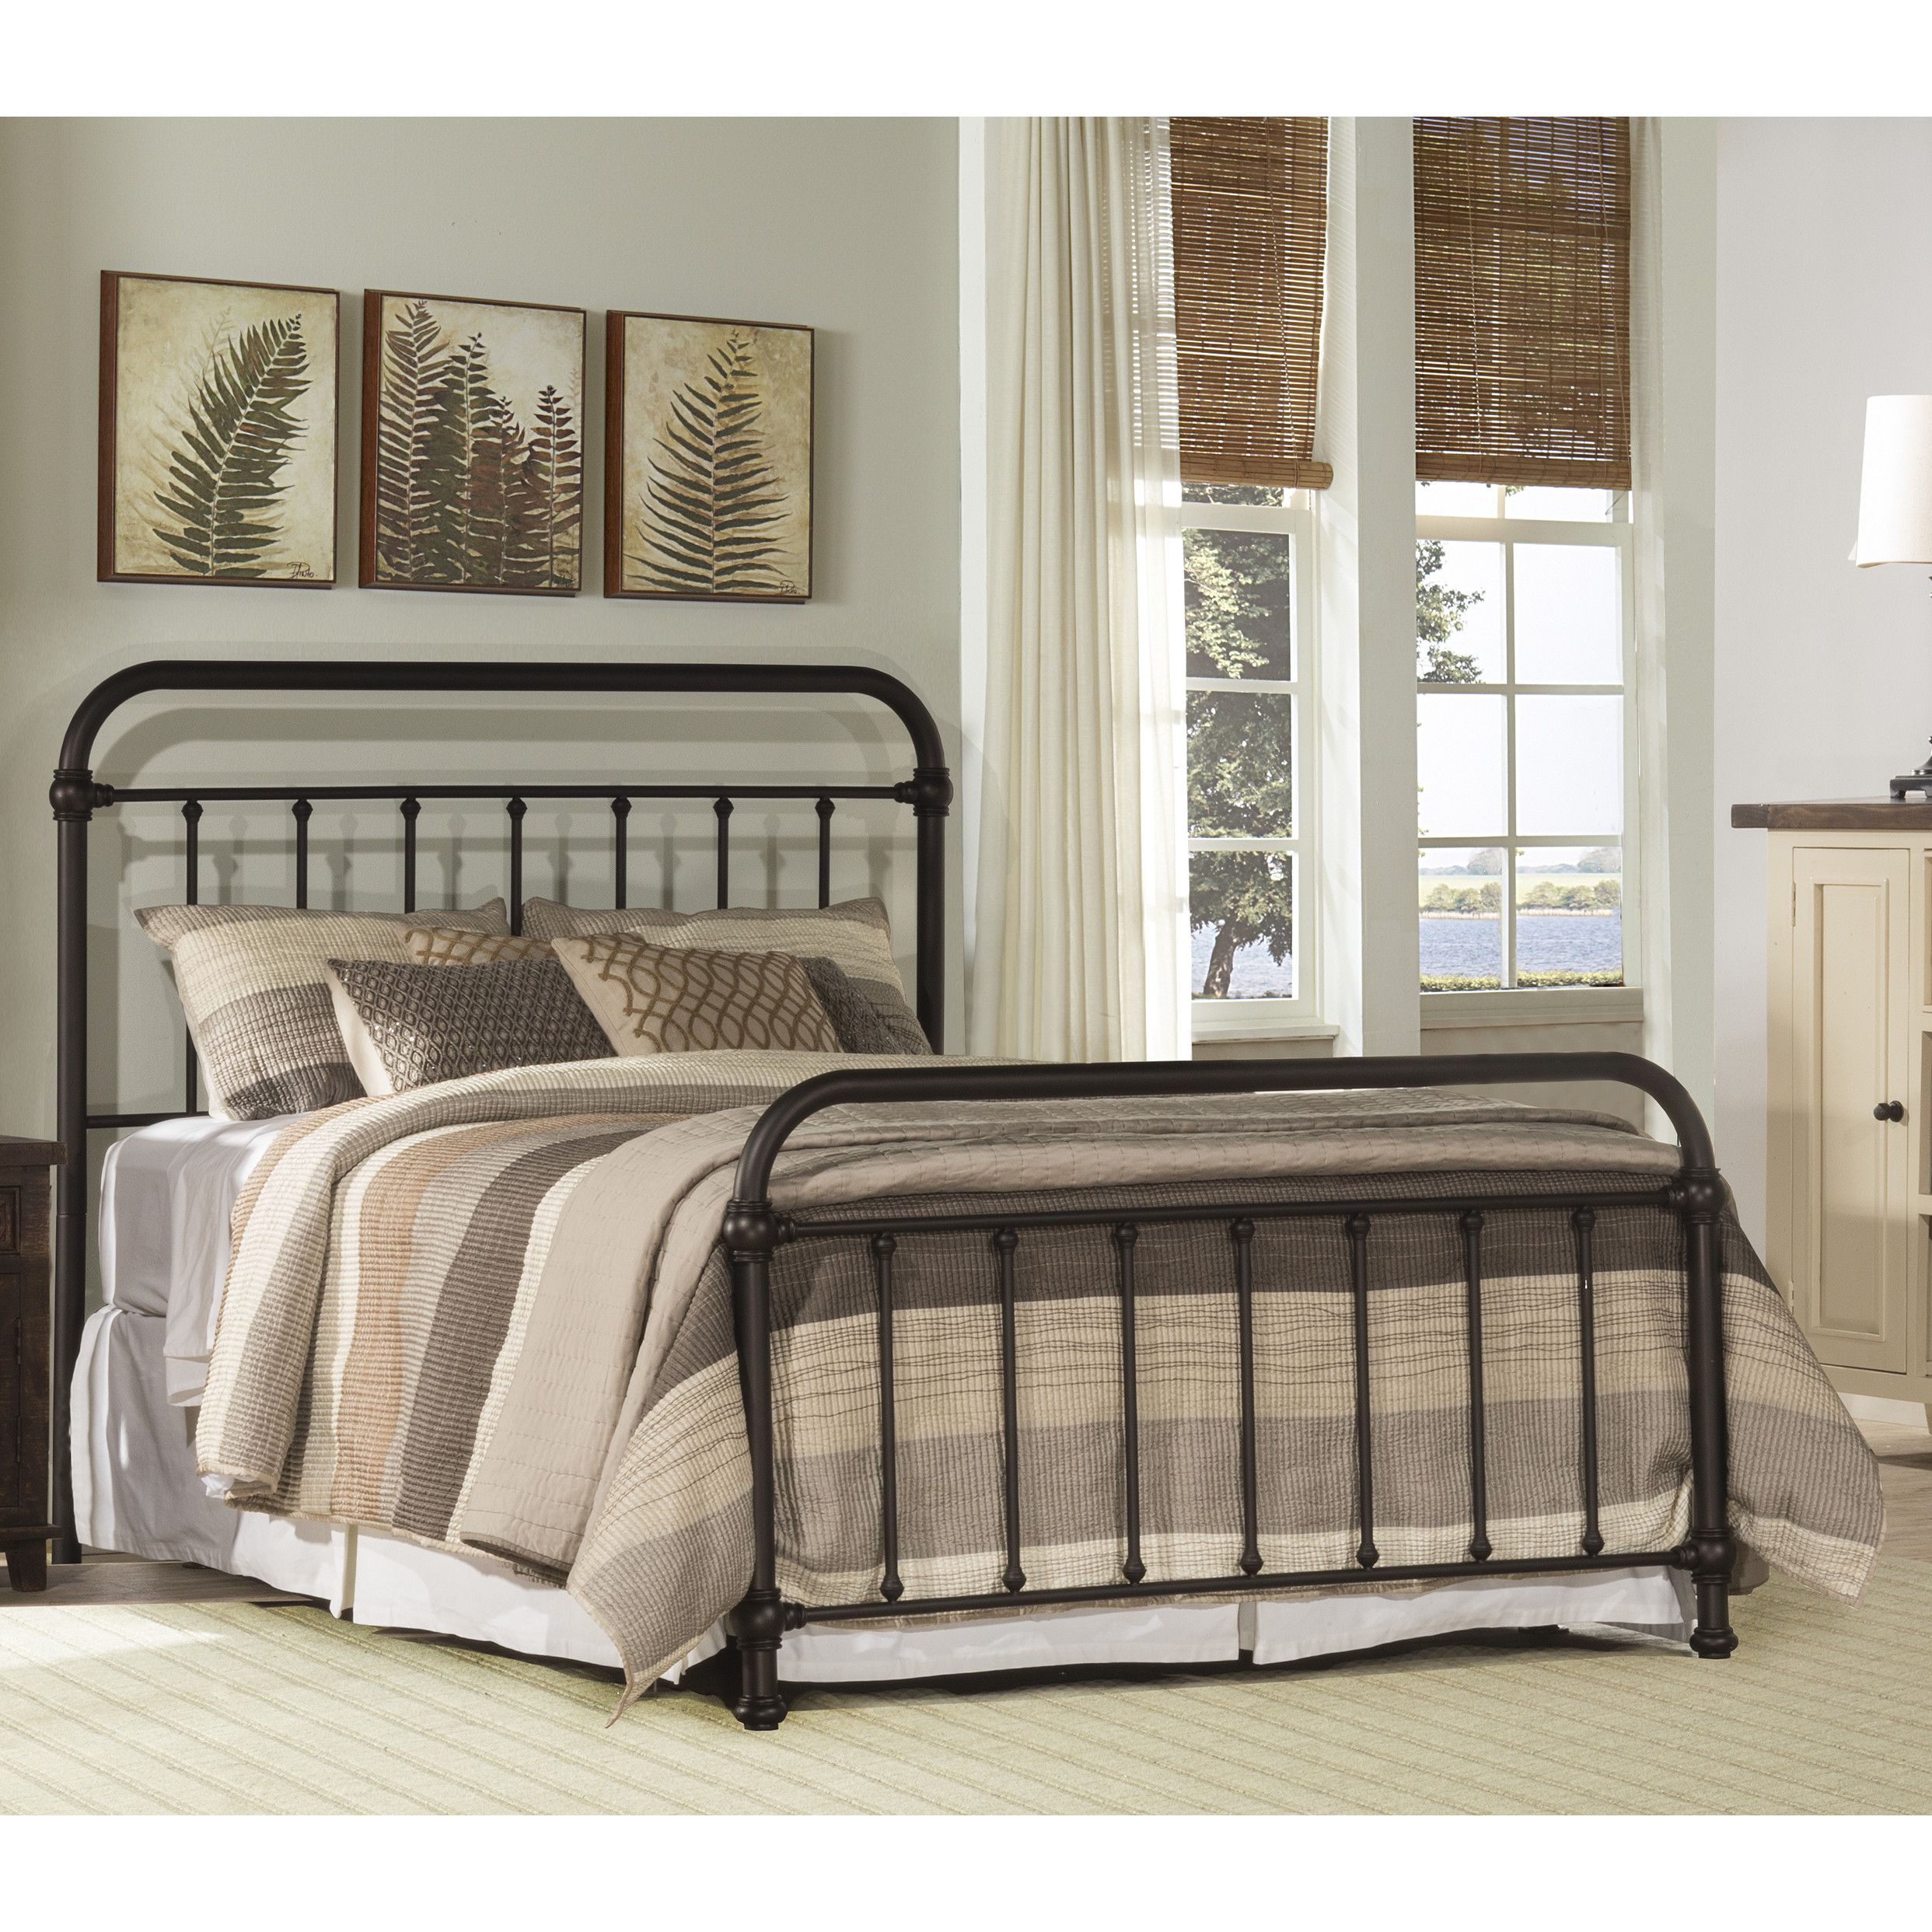 Laurel Foundry Modern Farmhouse Harlow Metal Panel Bed